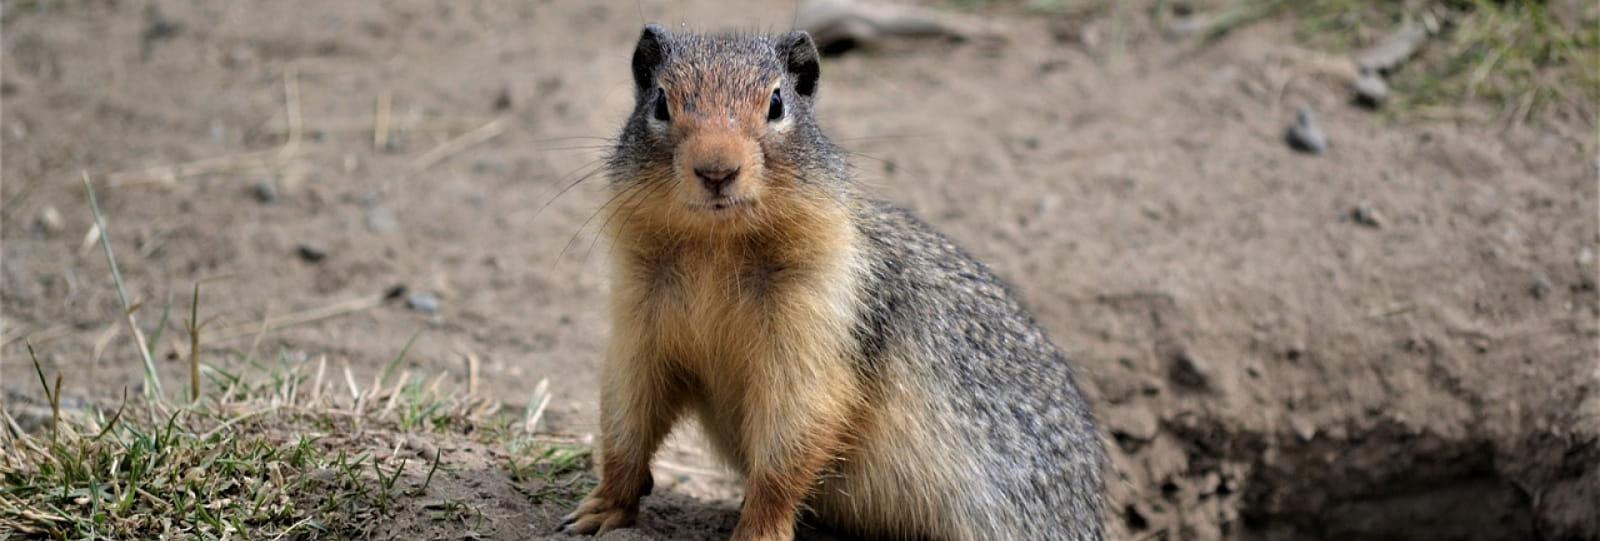 Marmotte es tu là ?